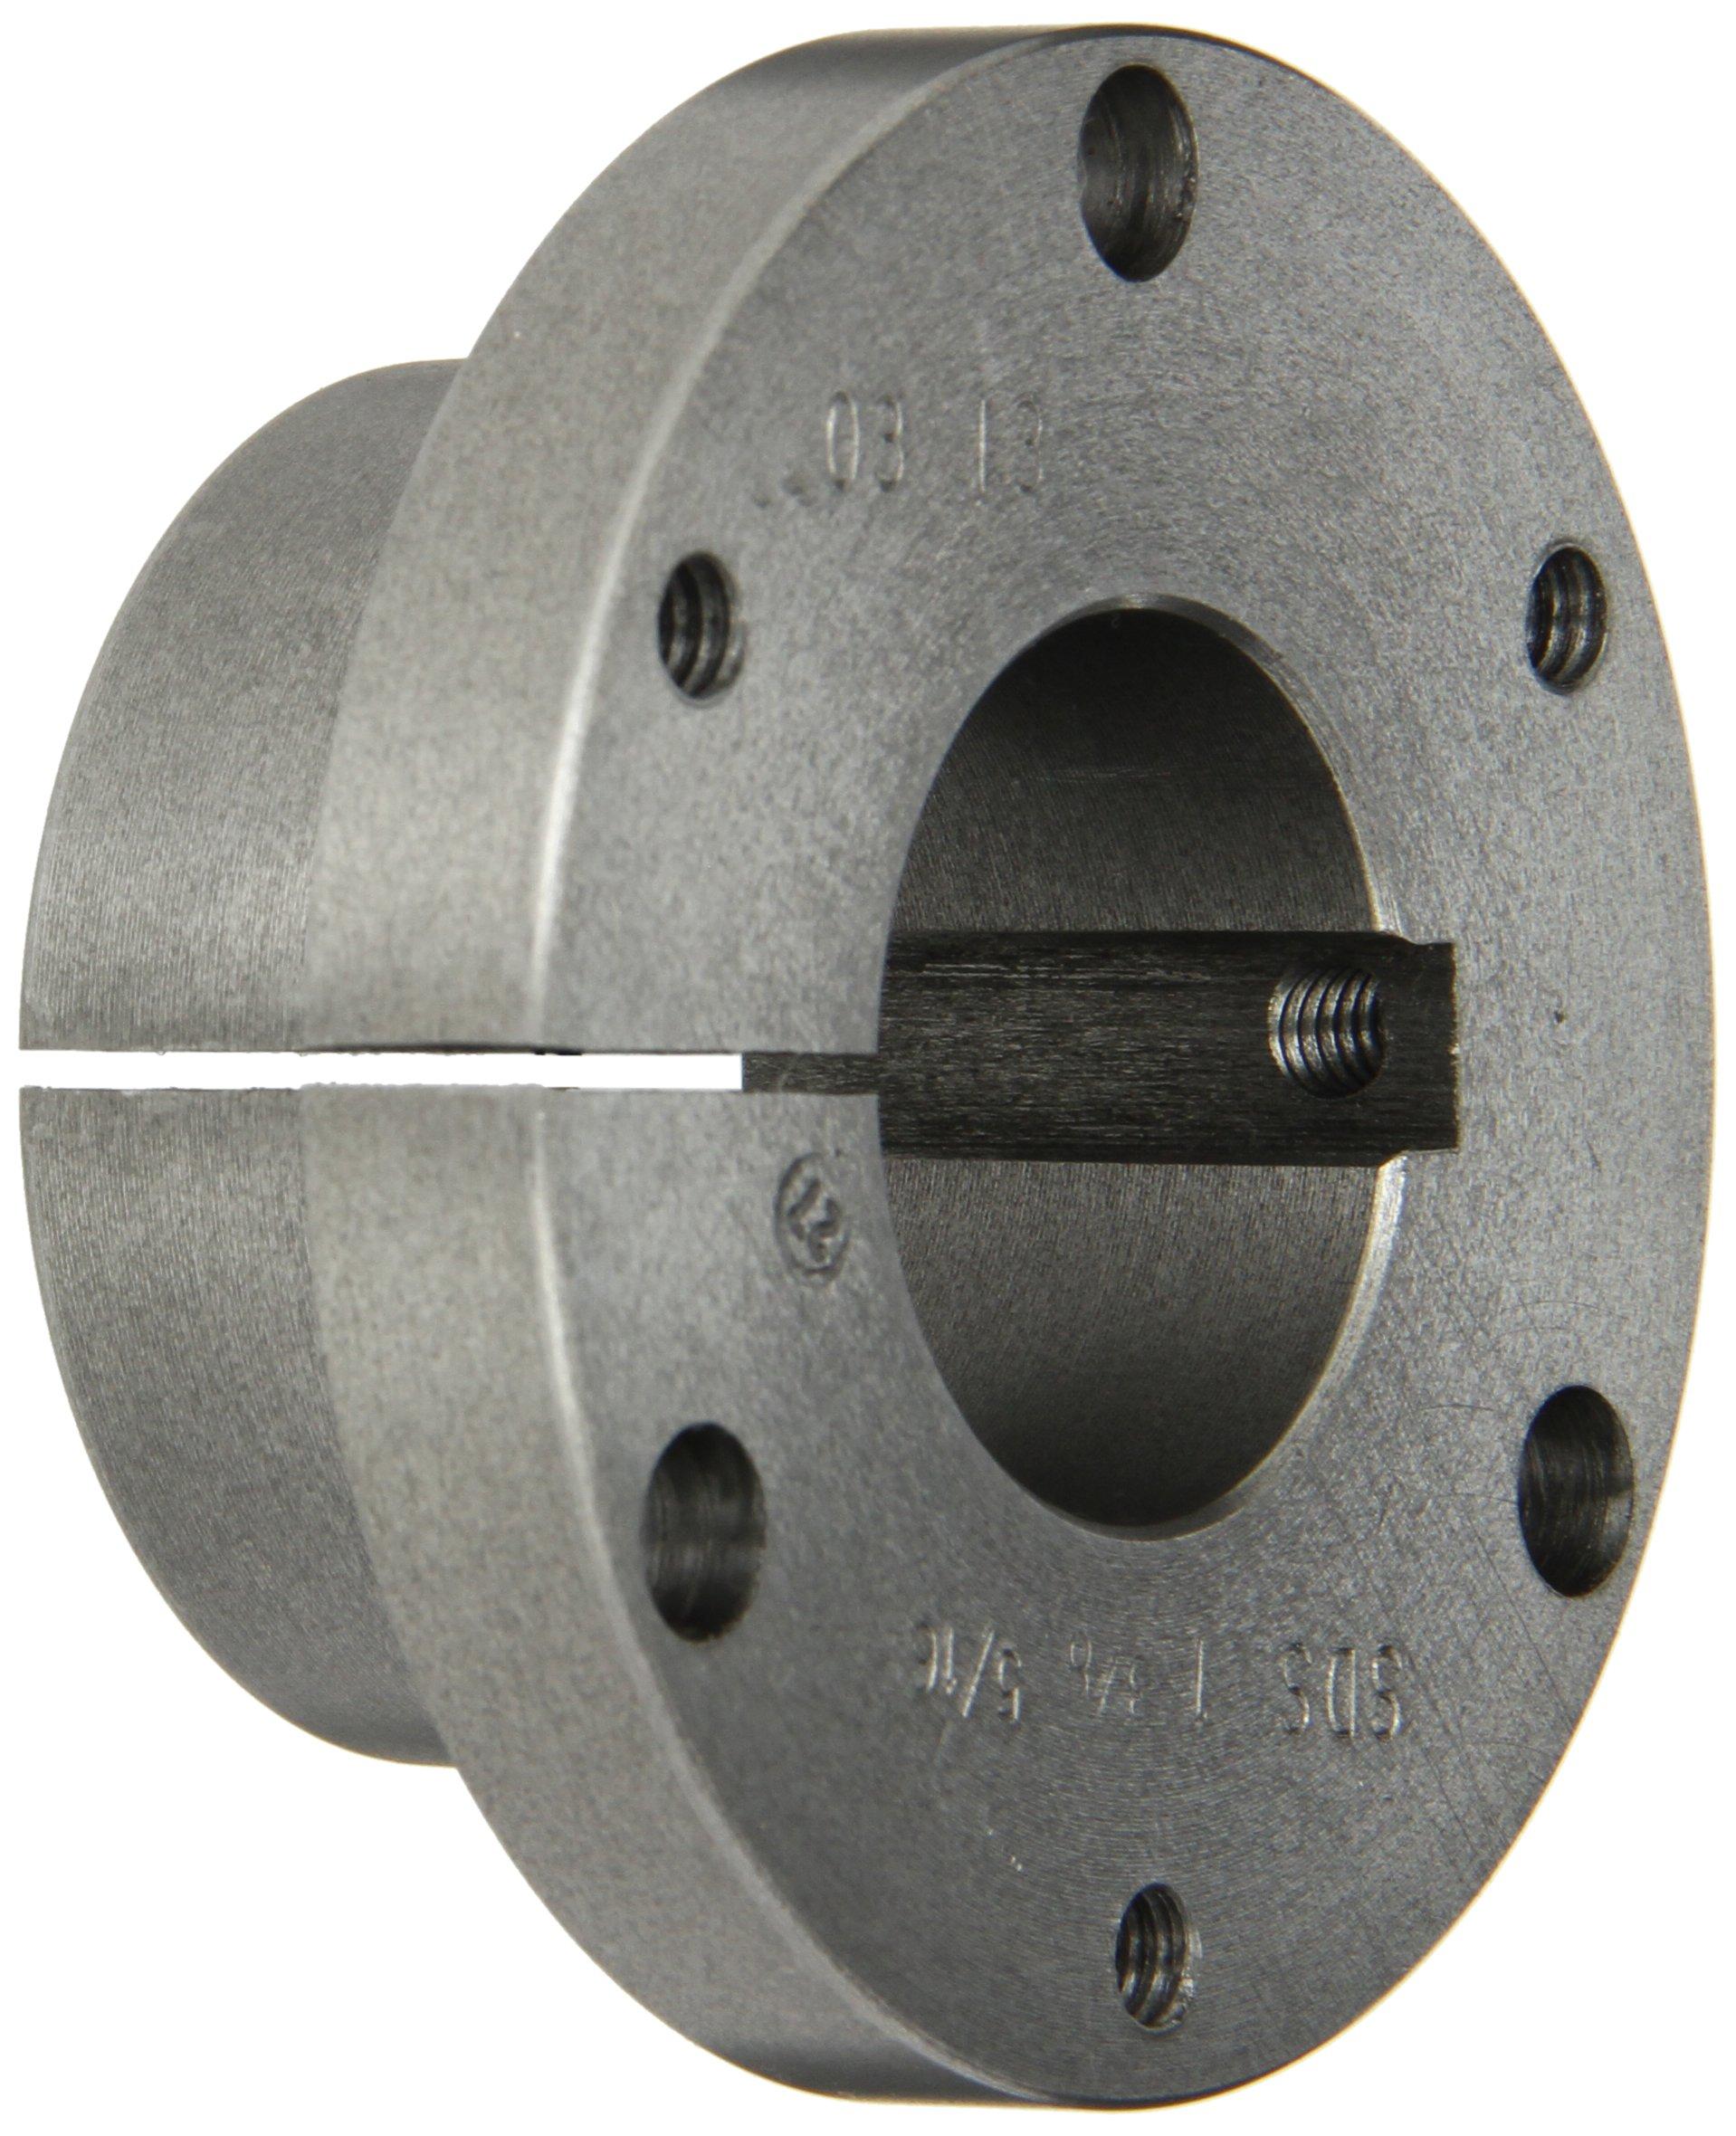 Browning SDS 1 3/8 5/16 Q-D Bushing 1-3/8 Bore 5/16